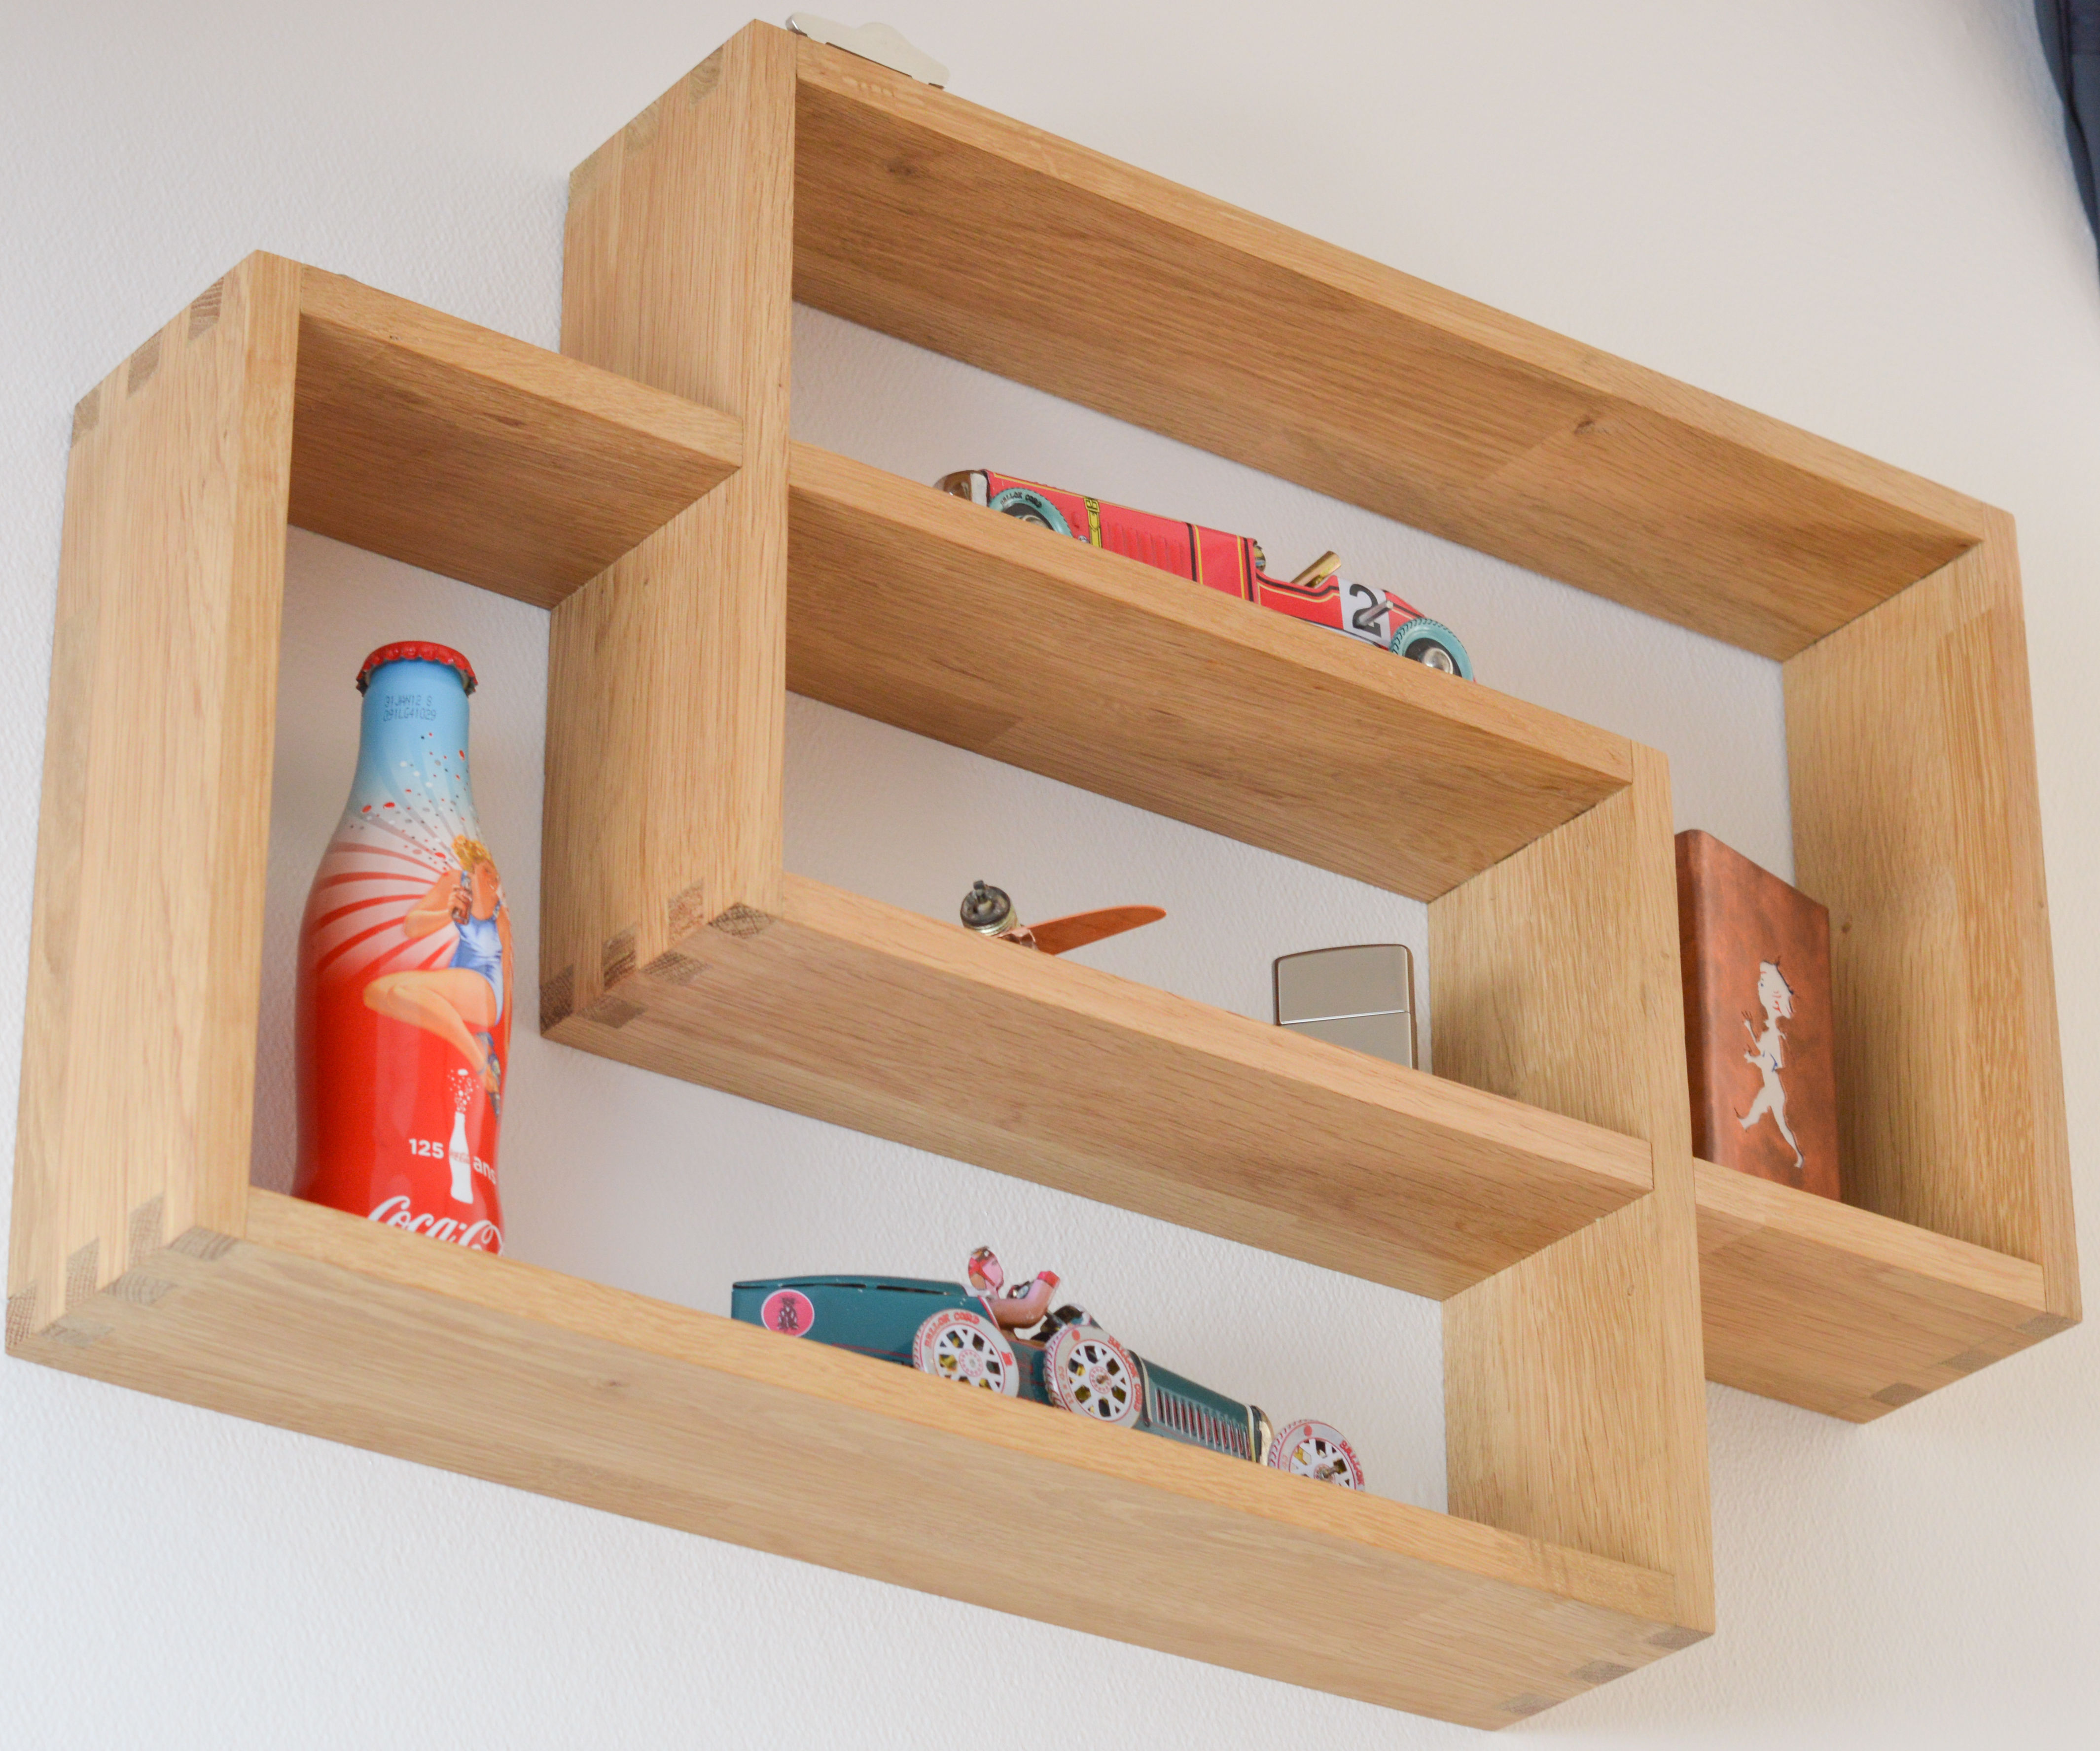 Interlocking Shelf